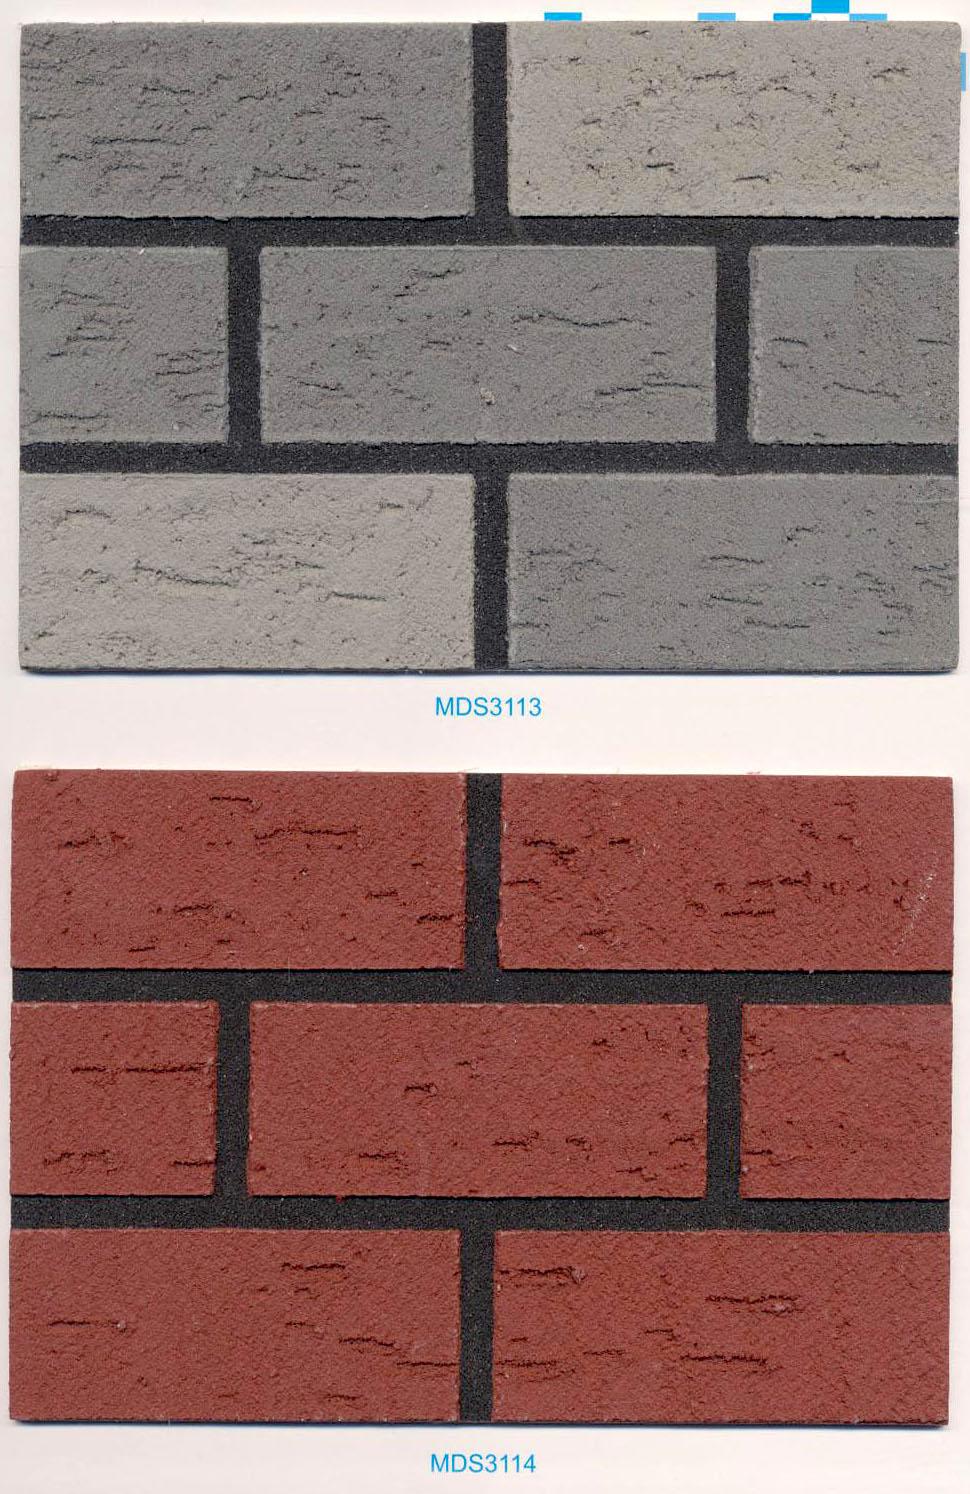 Maydos Desert Sand Building Material Stone Texture Wall Paint - Buy Desert  Sand Building Material,Stone Texture Wall Paint,Texture Paint Product on